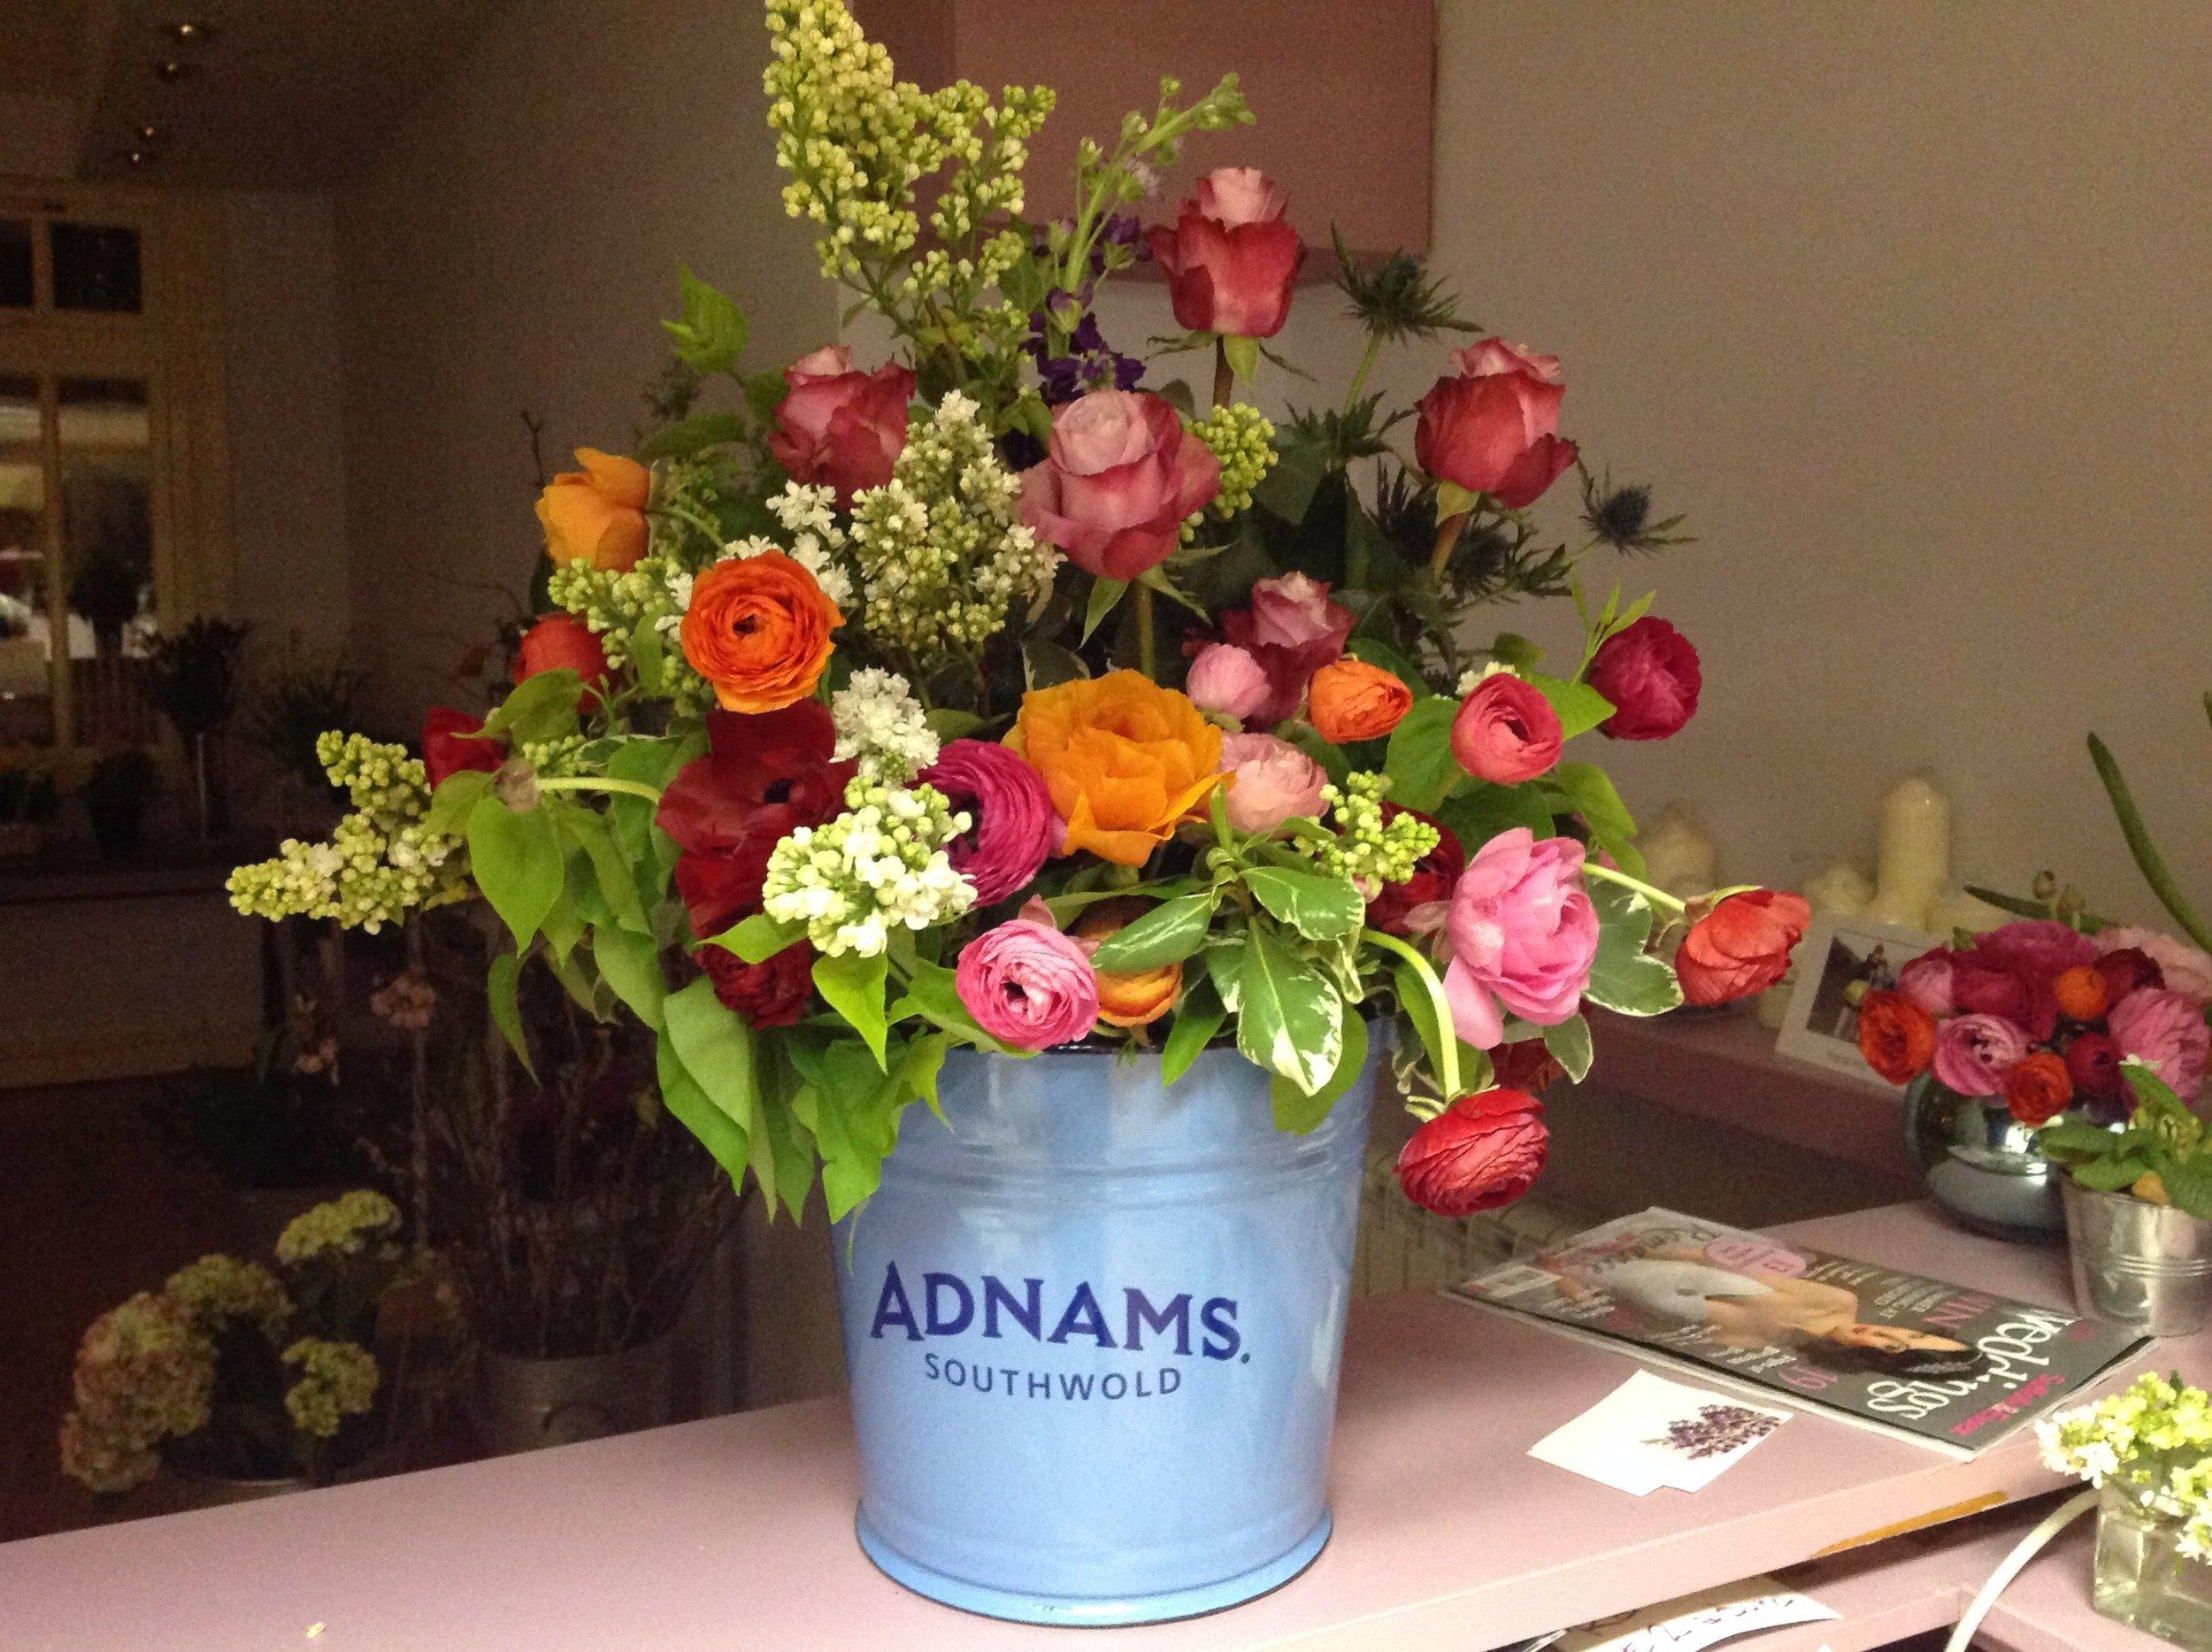 lilac_thyme-flowers_adnams_pot.jpeg